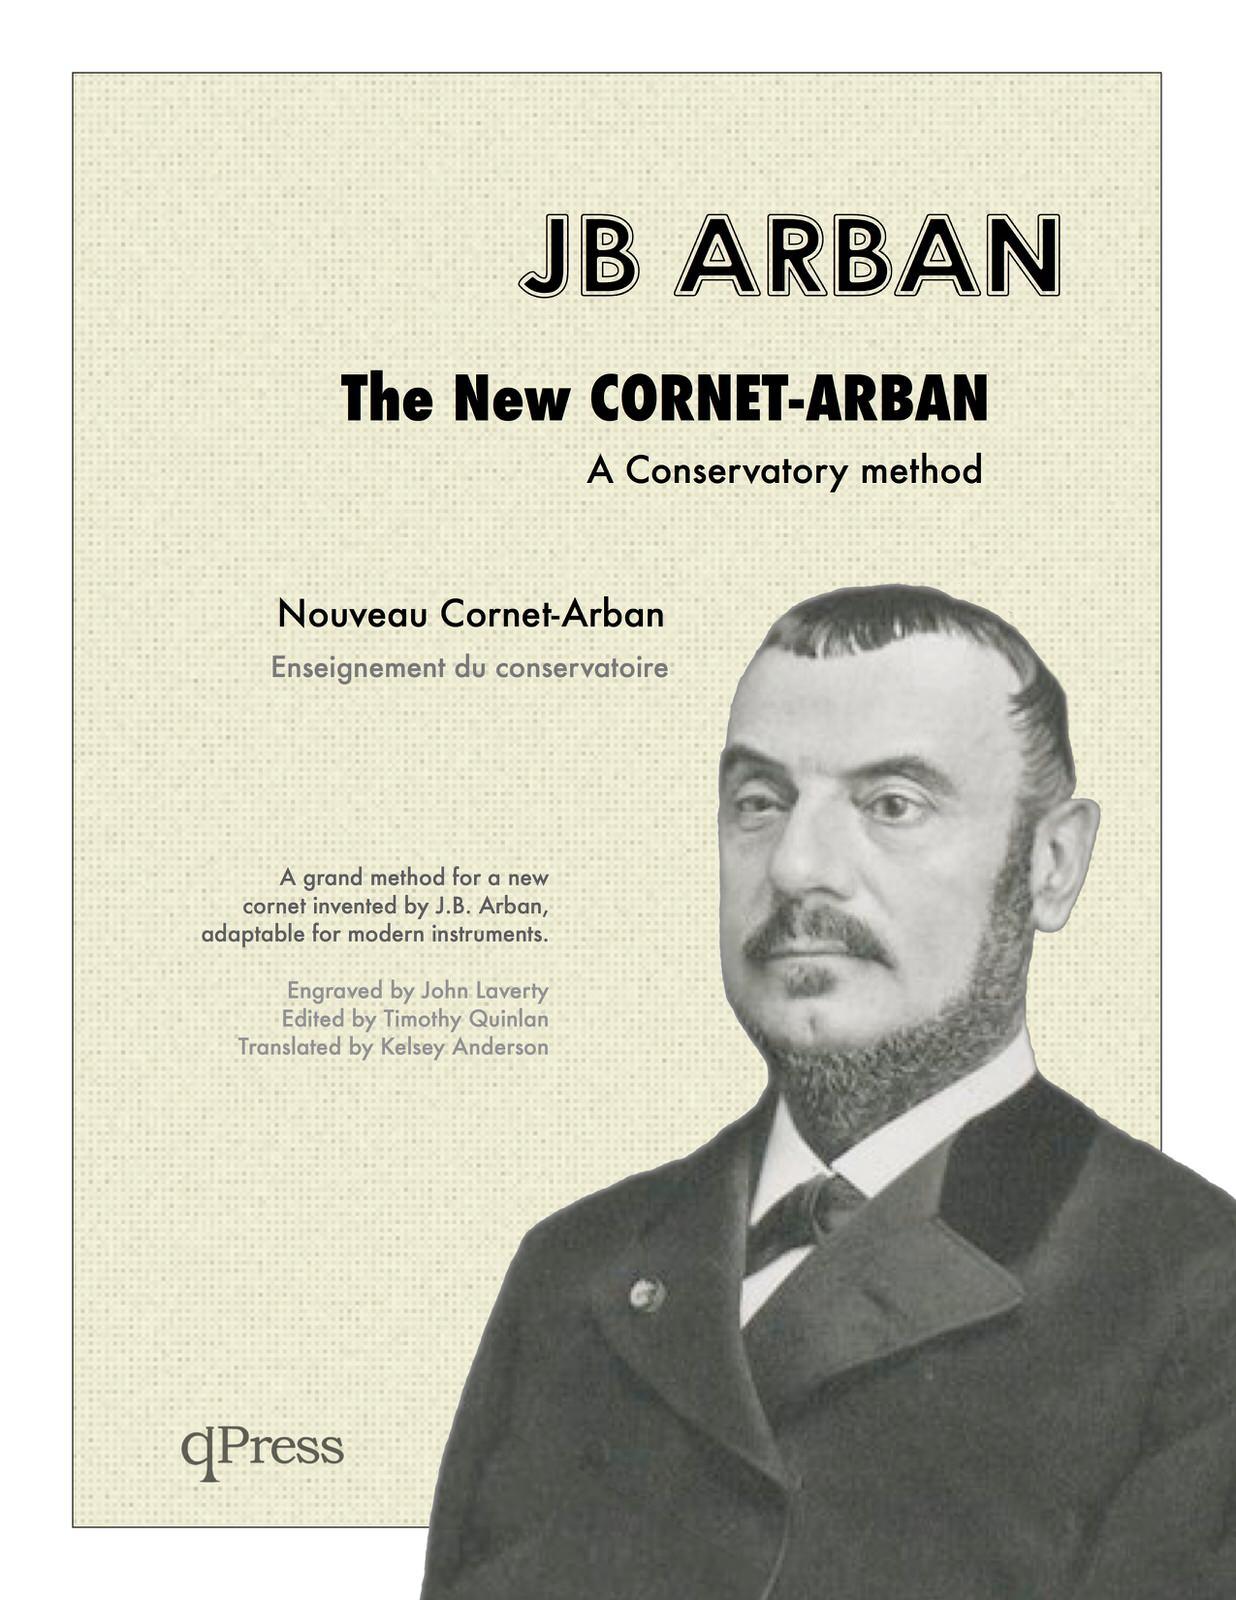 Arban, The New Cornet-Arban Conservatory Method-p01